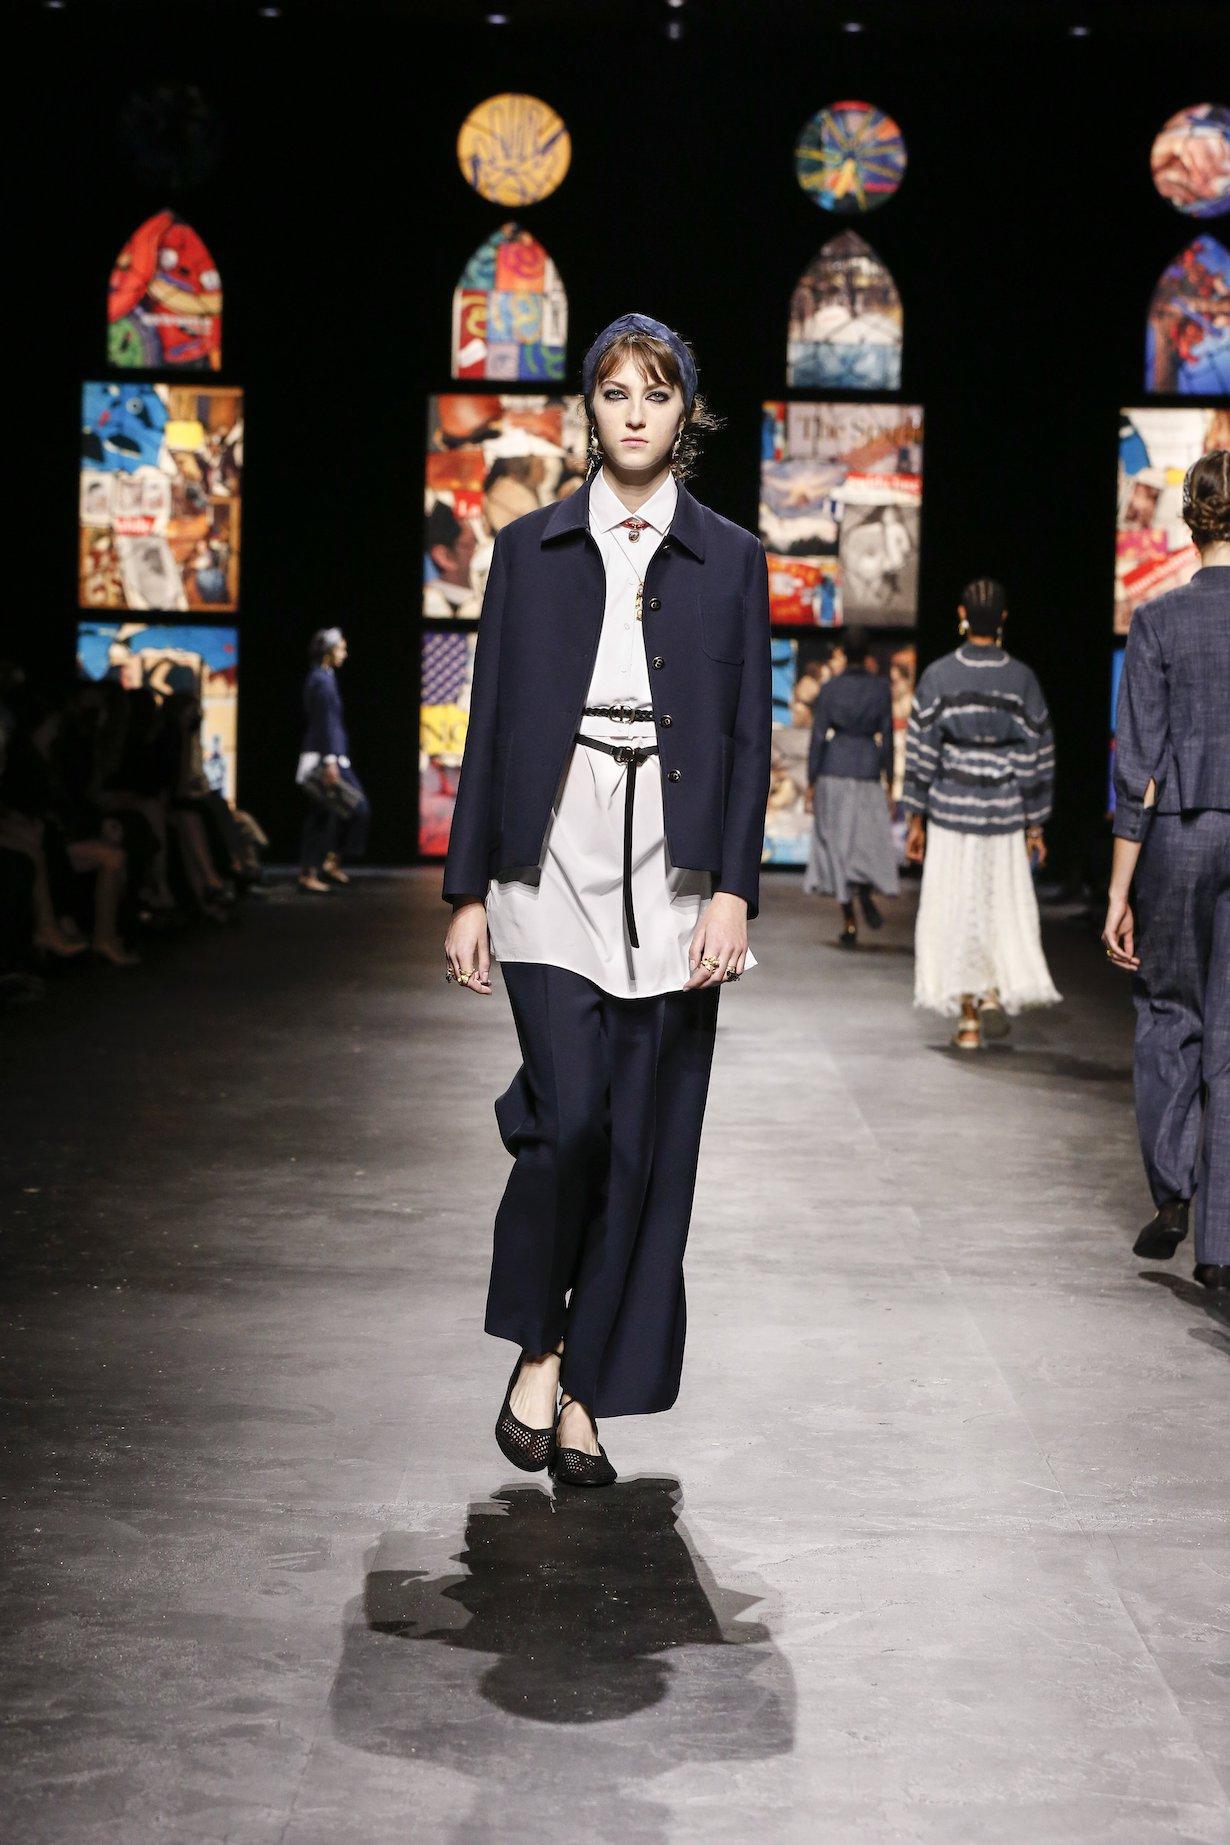 dior 2021 ss paris new silhouette bar jacket